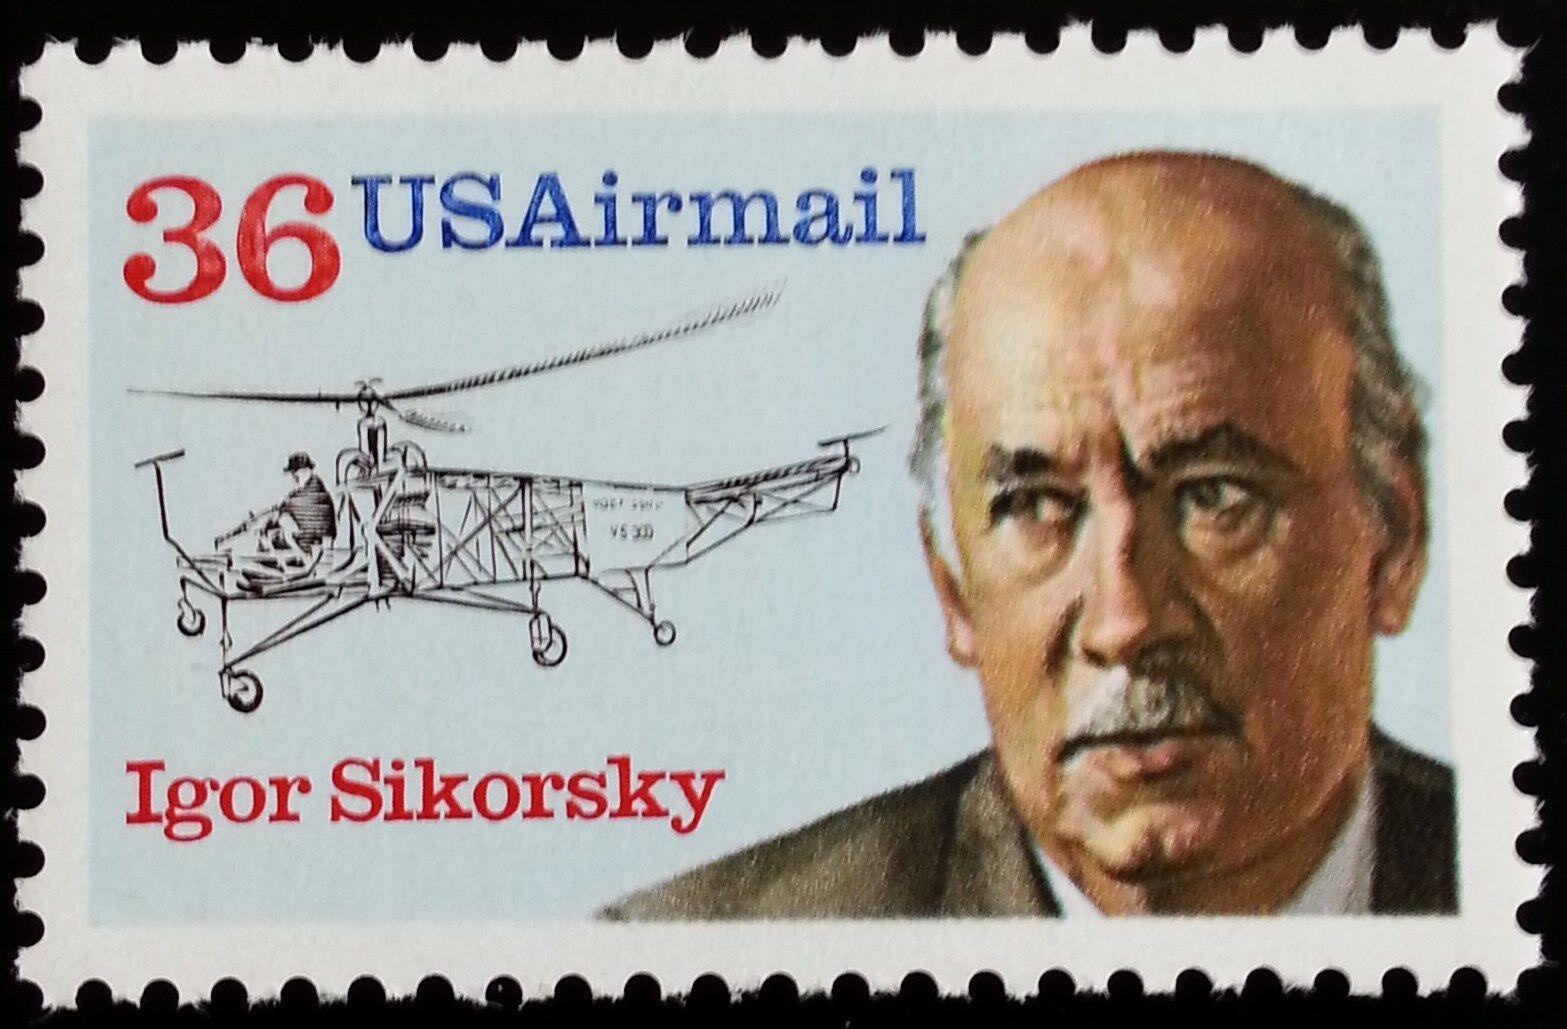 1988 36c Igor Sikorsky, Russian American Aviation Pione